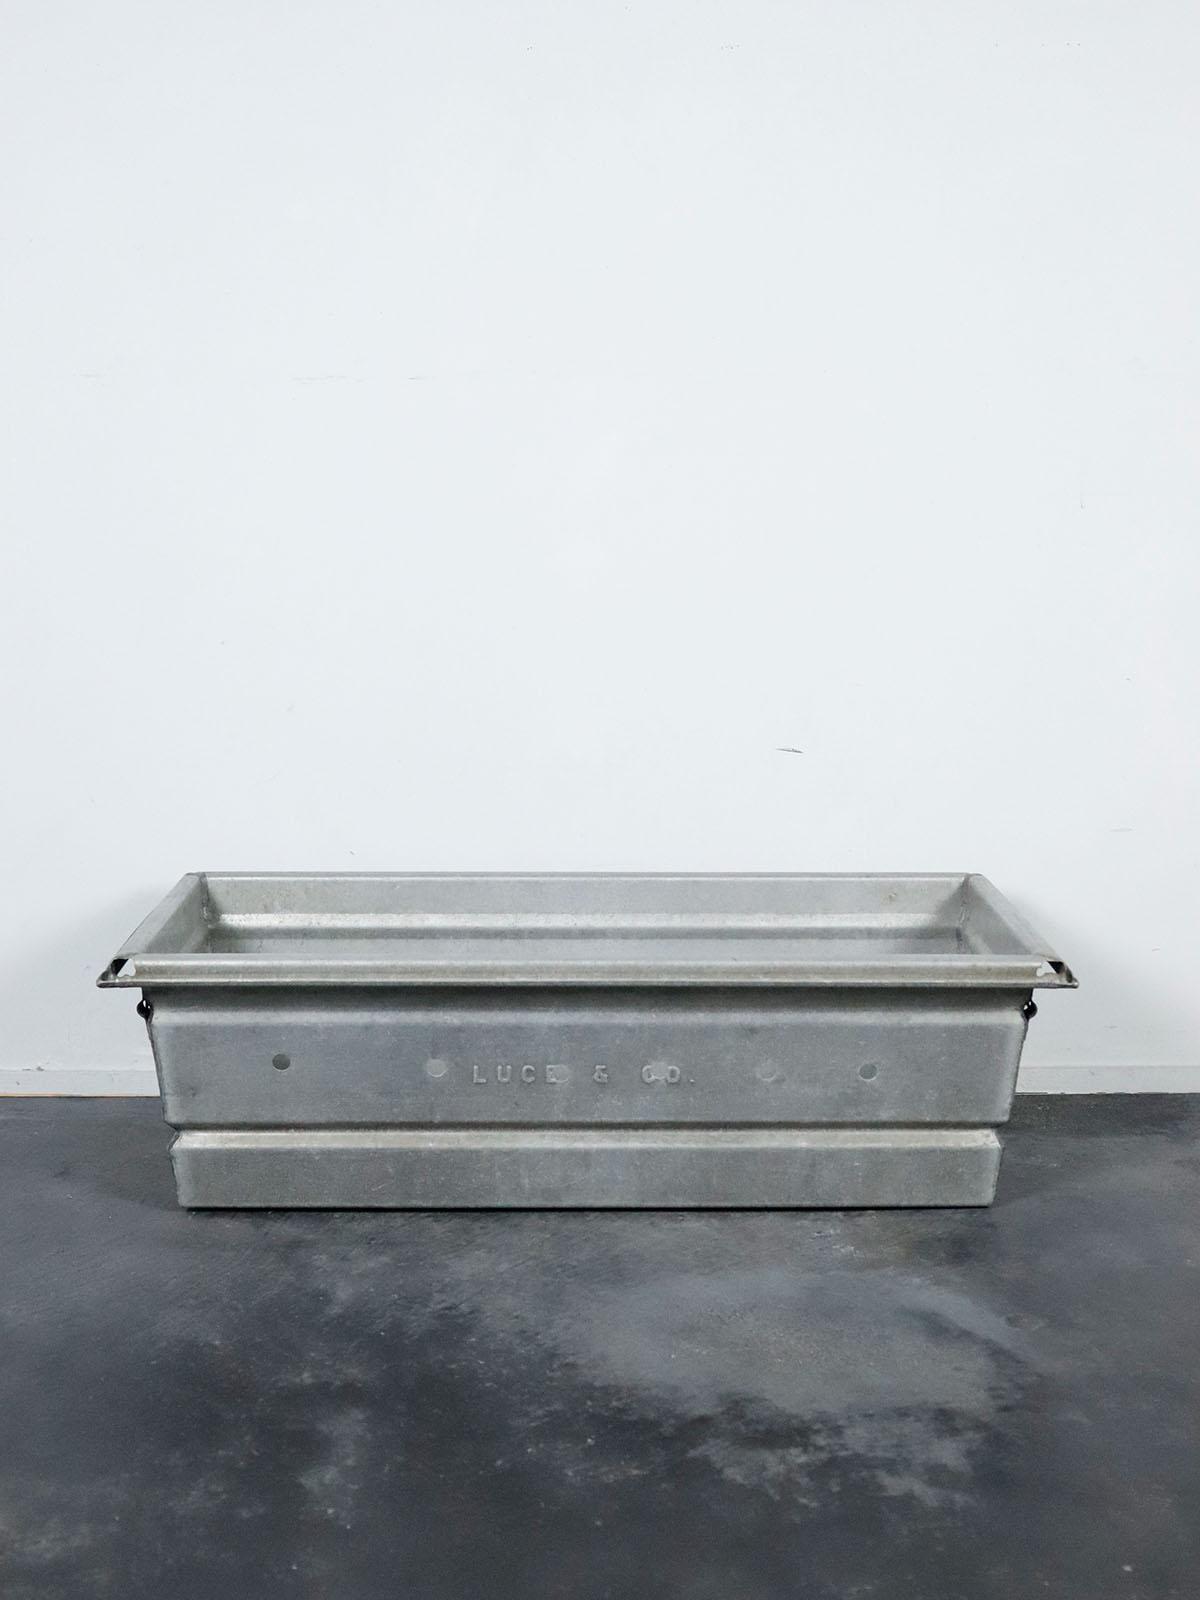 vintage,aluminum crate,usa,luce&co